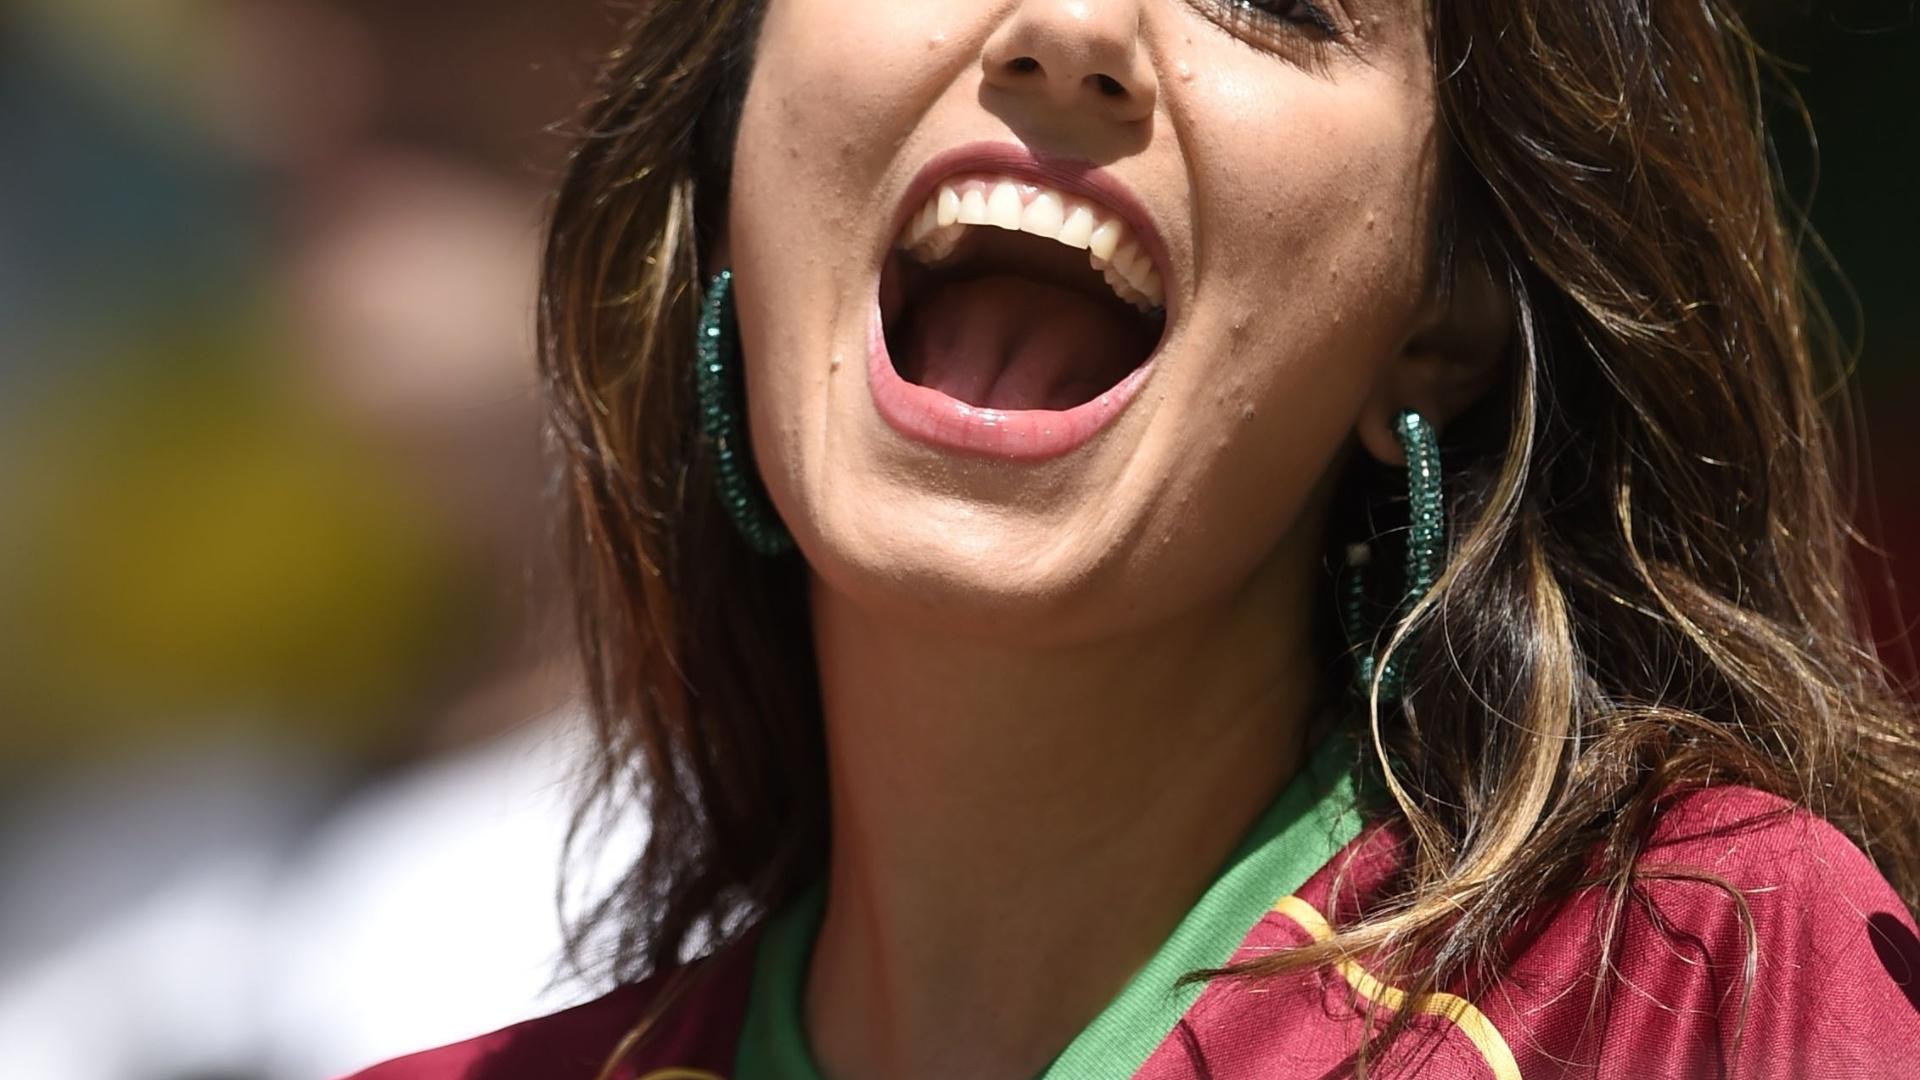 16.jun.2014 - Torcedora de Portugal mostra sua beleza na Arena Fonte Nova